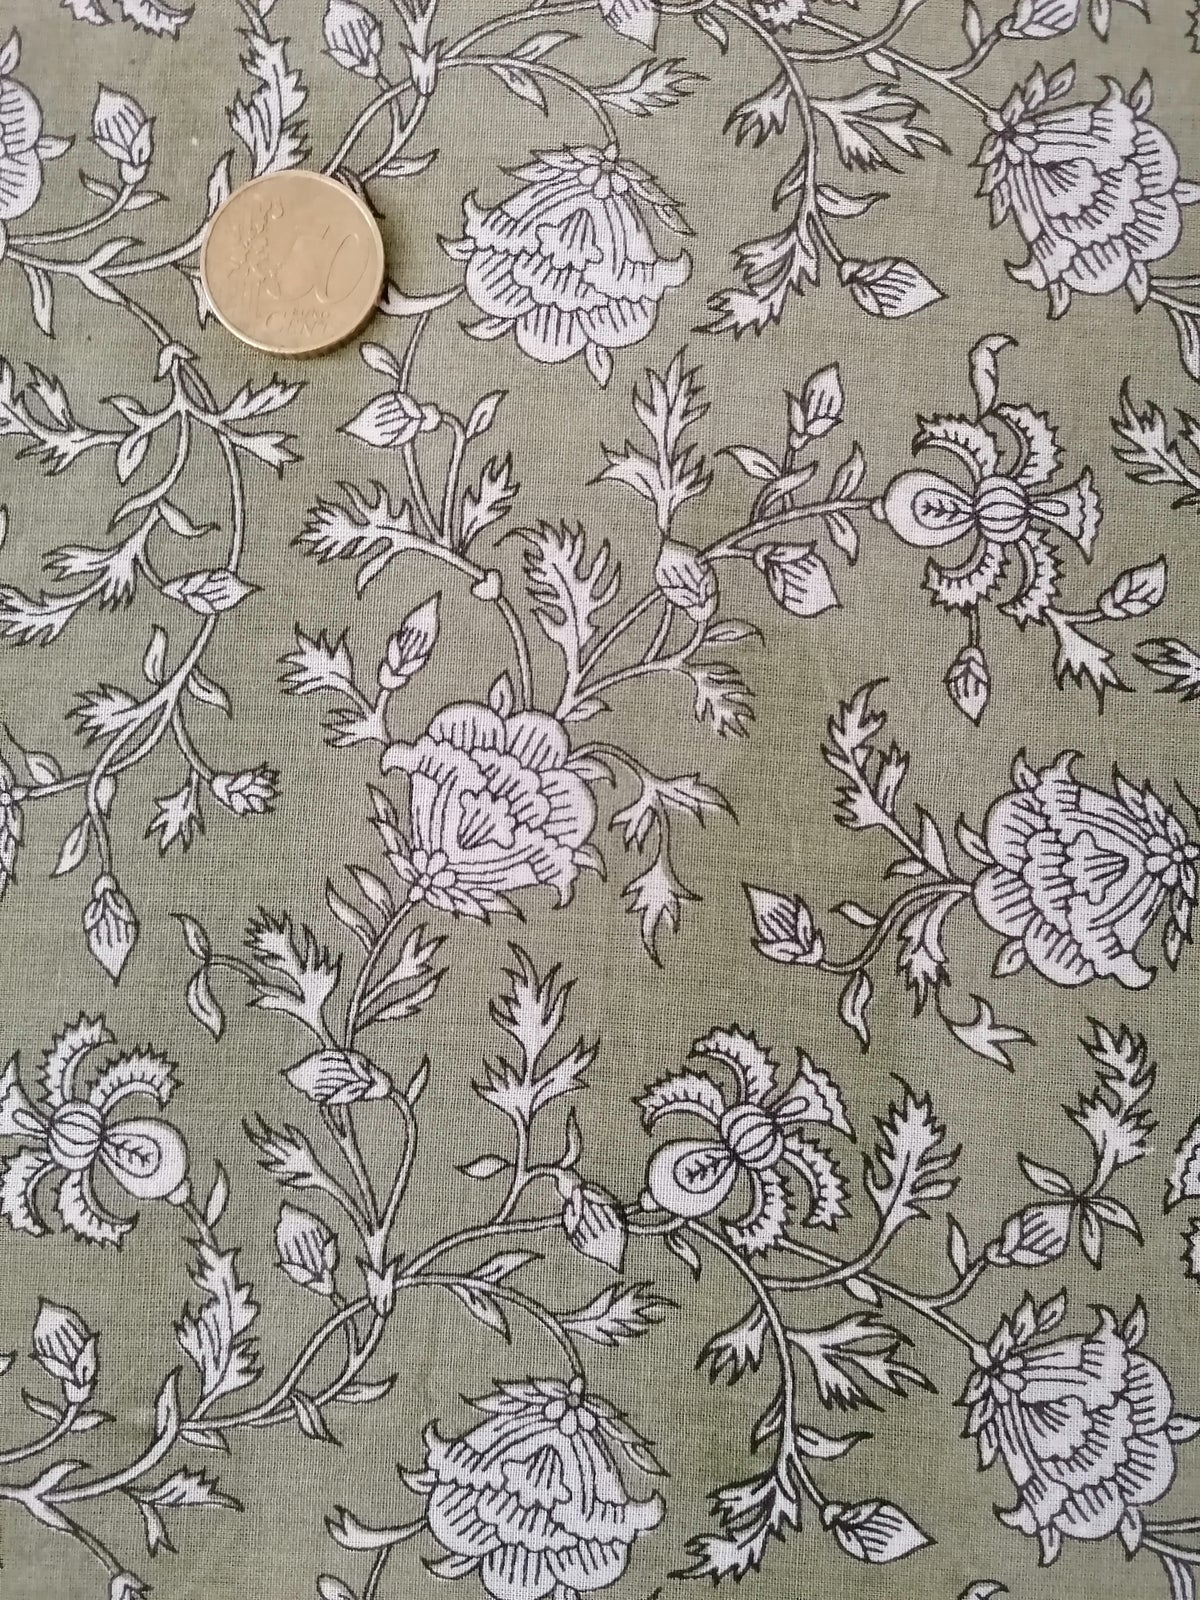 Image of Namasté fabric kaki petites fleurs blanches